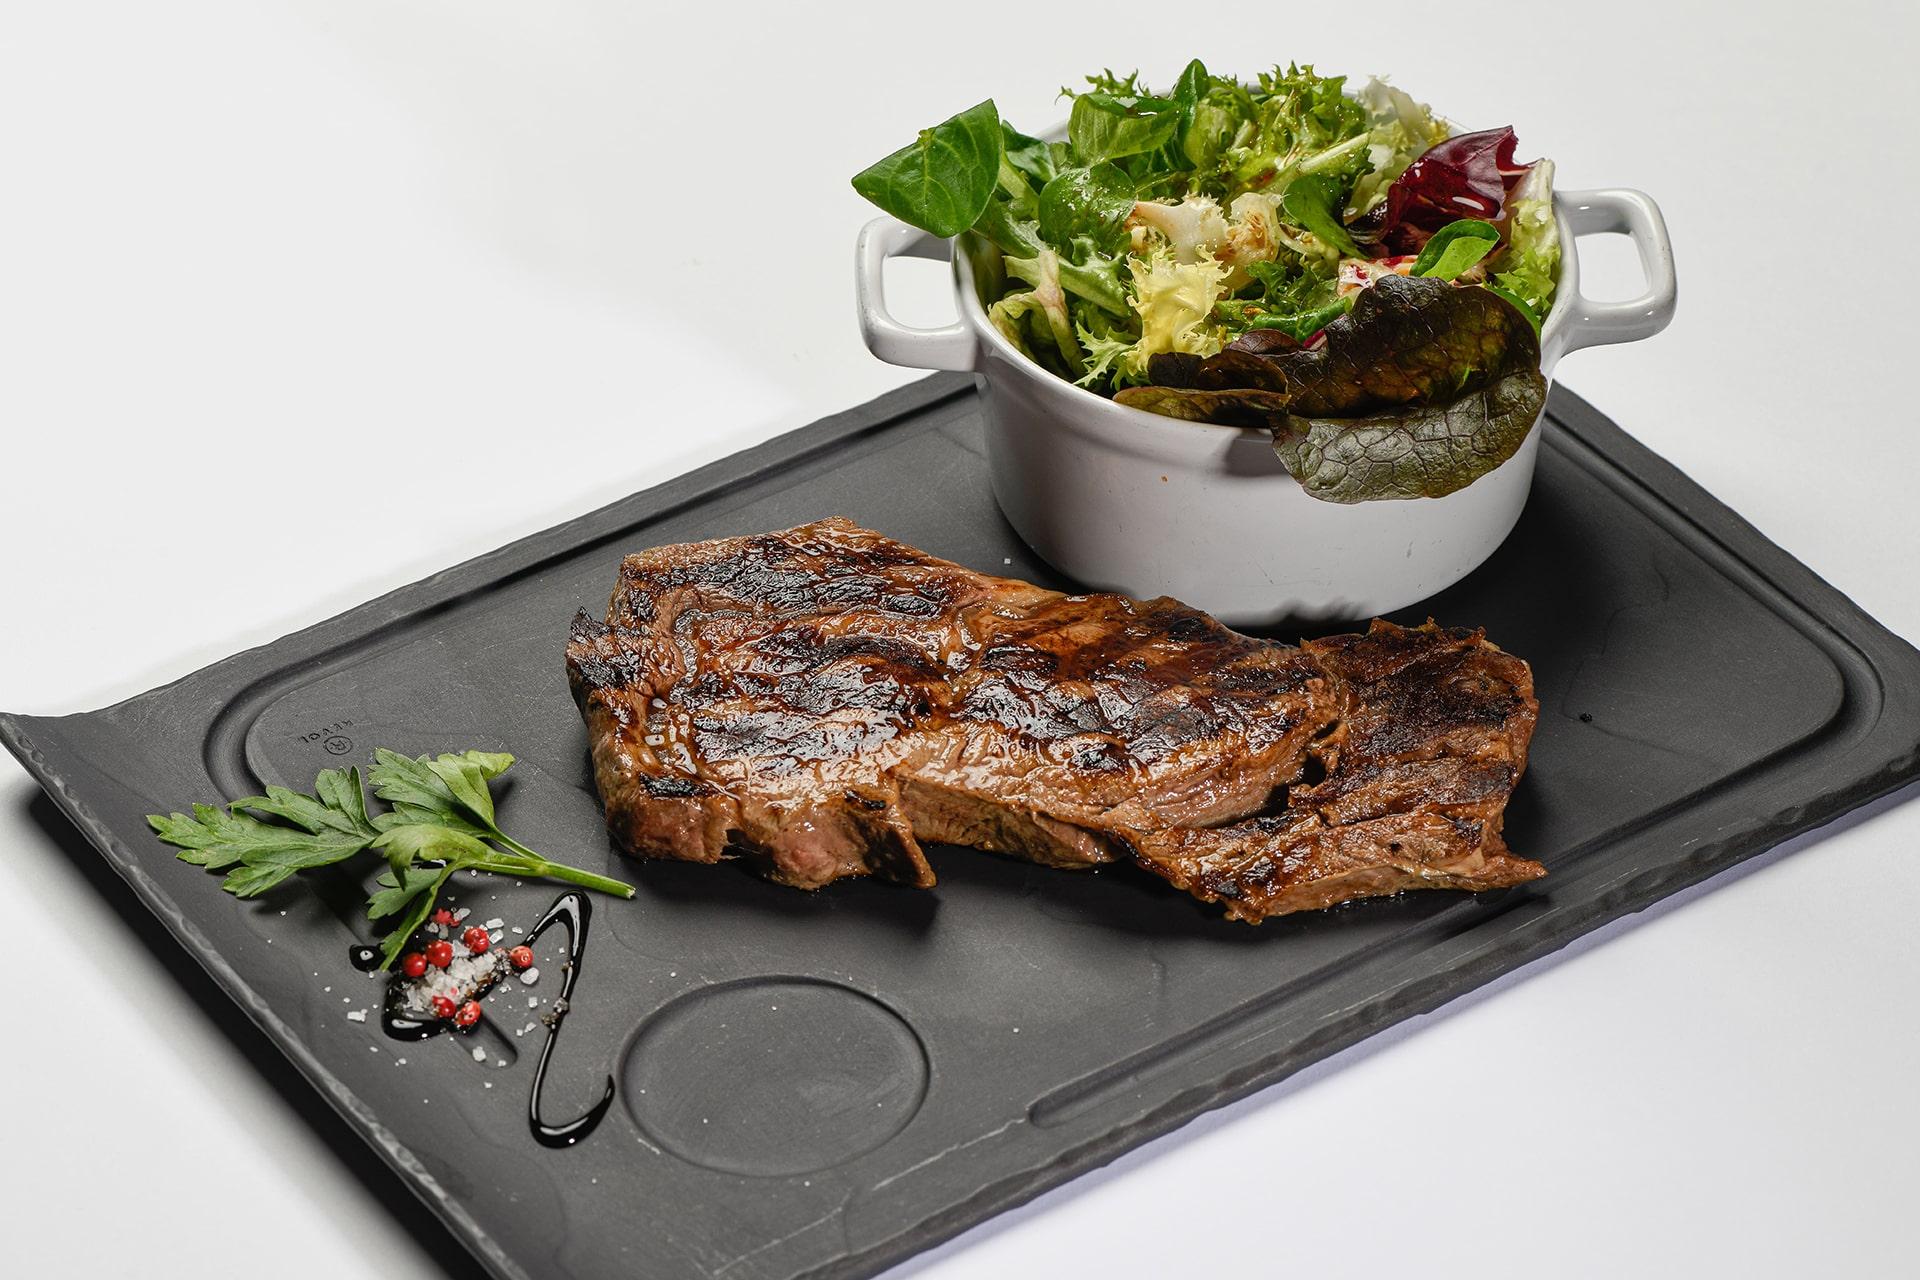 https://www.restaurant-st-julien.fr/wp-content/uploads/2021/06/restau-2-min.jpg